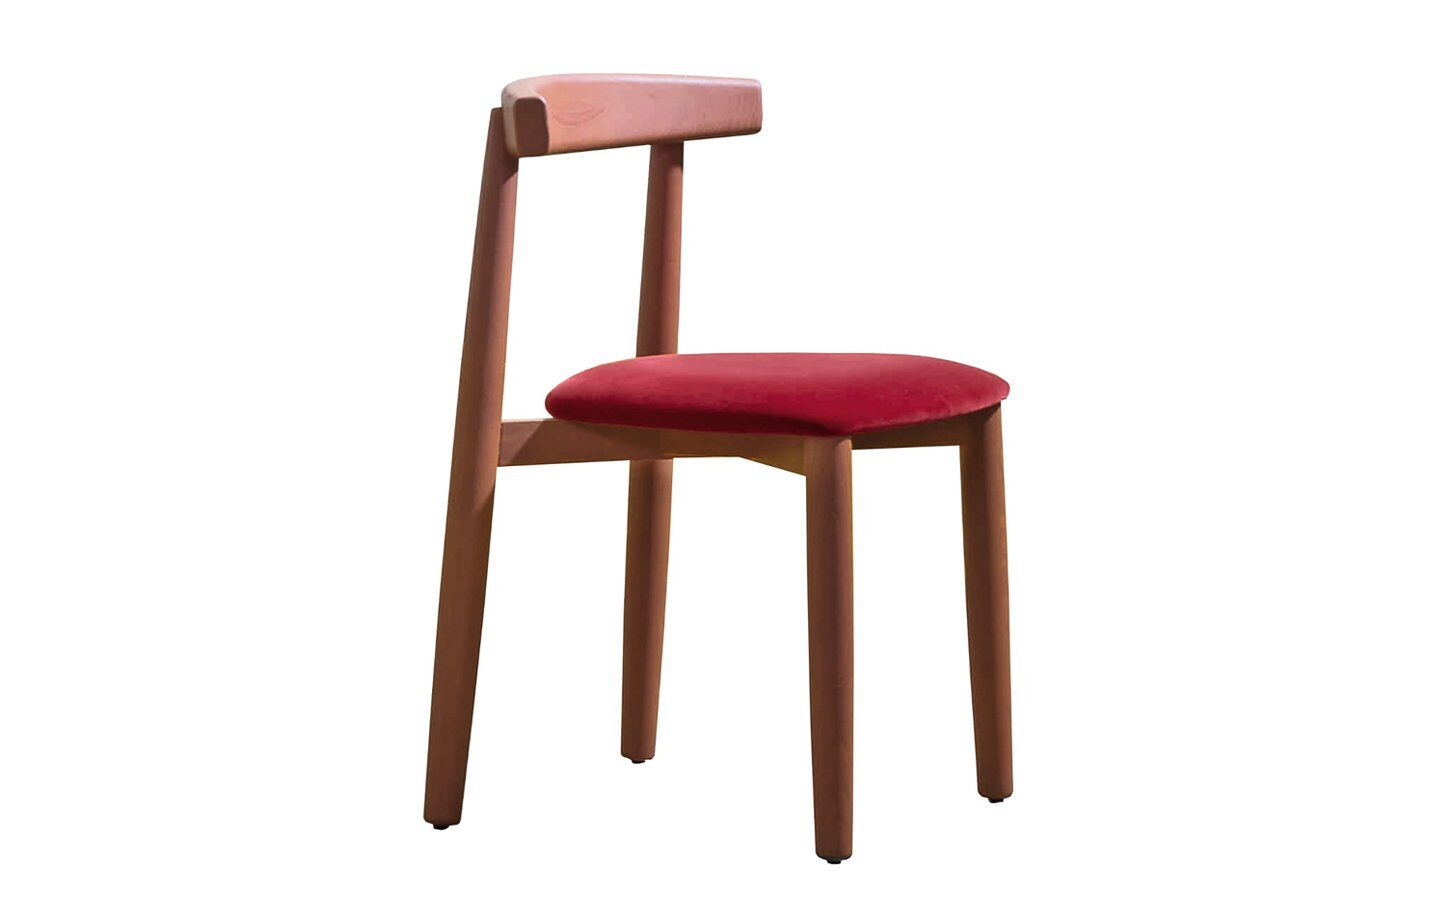 Claretta-bold-dining-side-chair-01